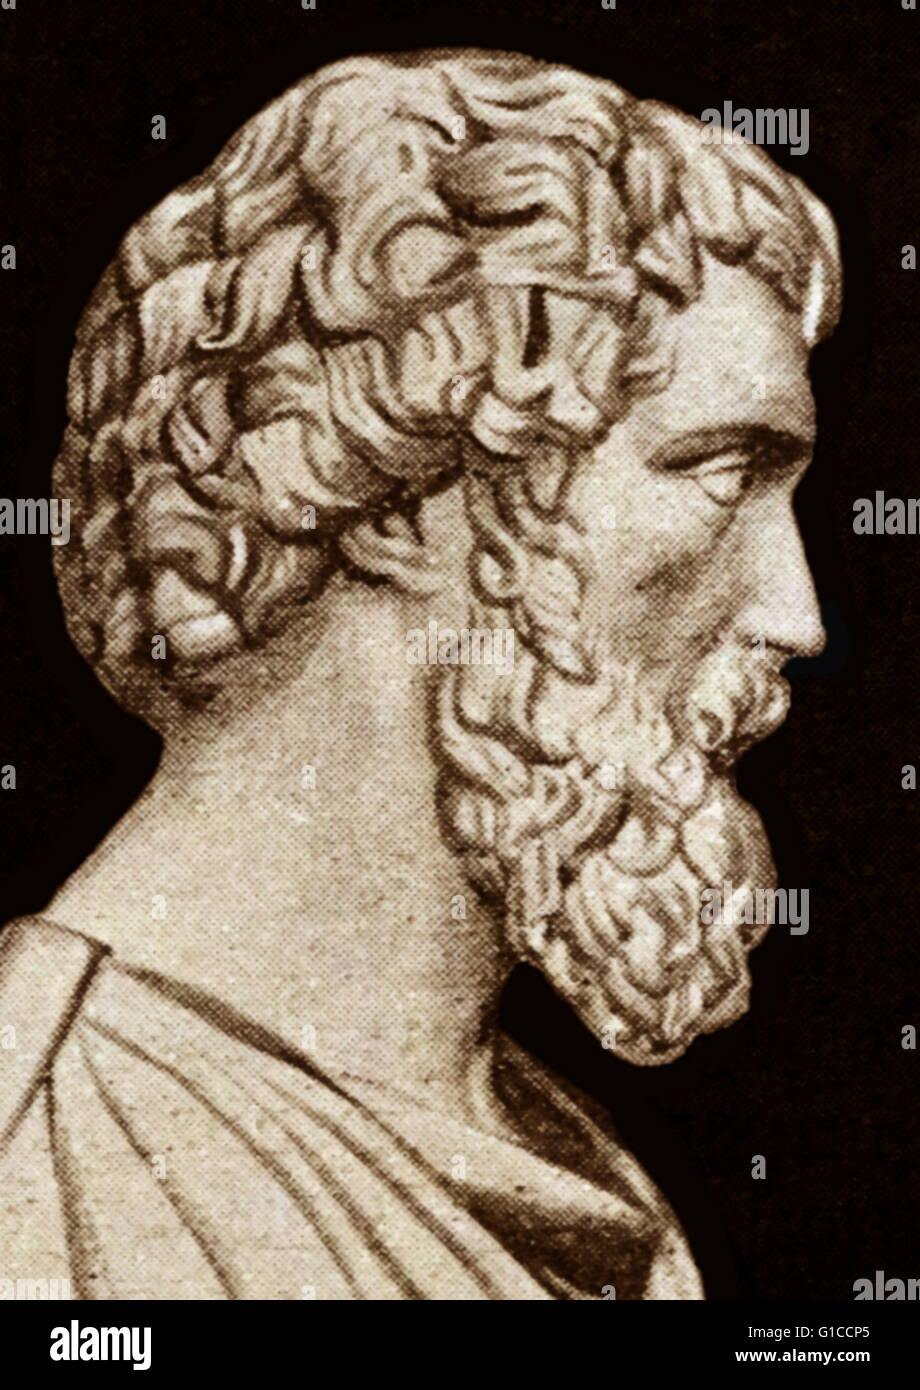 Bust of the Roman Emperor Didius Julianus - Stock Image